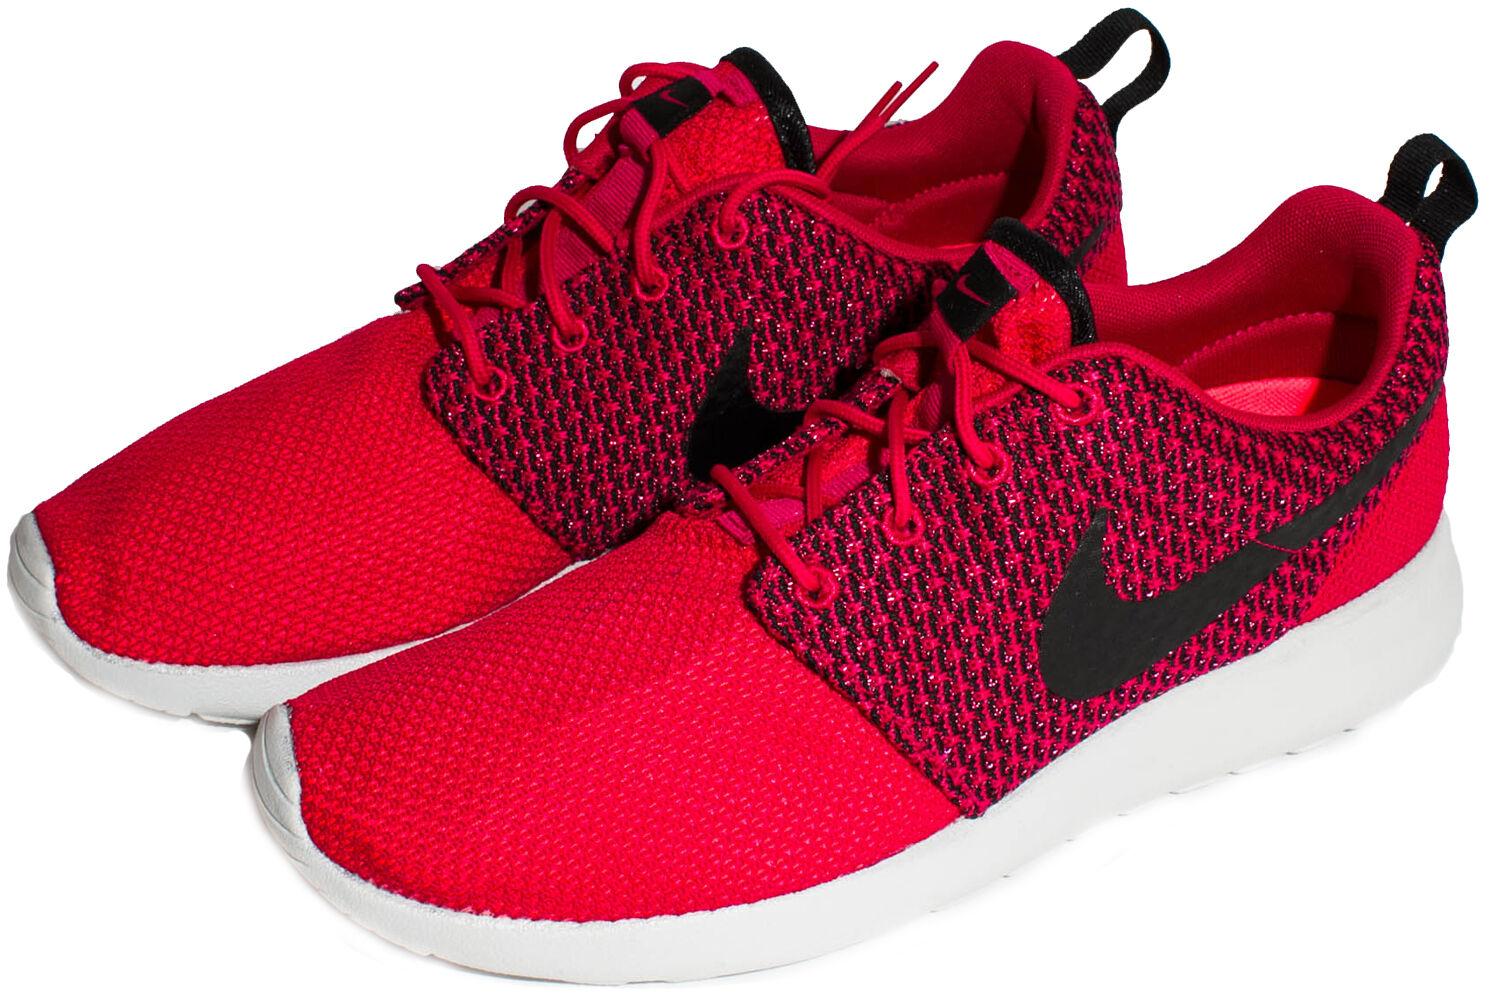 Nike Rosherun Men's shoes Fuchsia Force Black Hyper Punch 511881-662 sz. 9-12